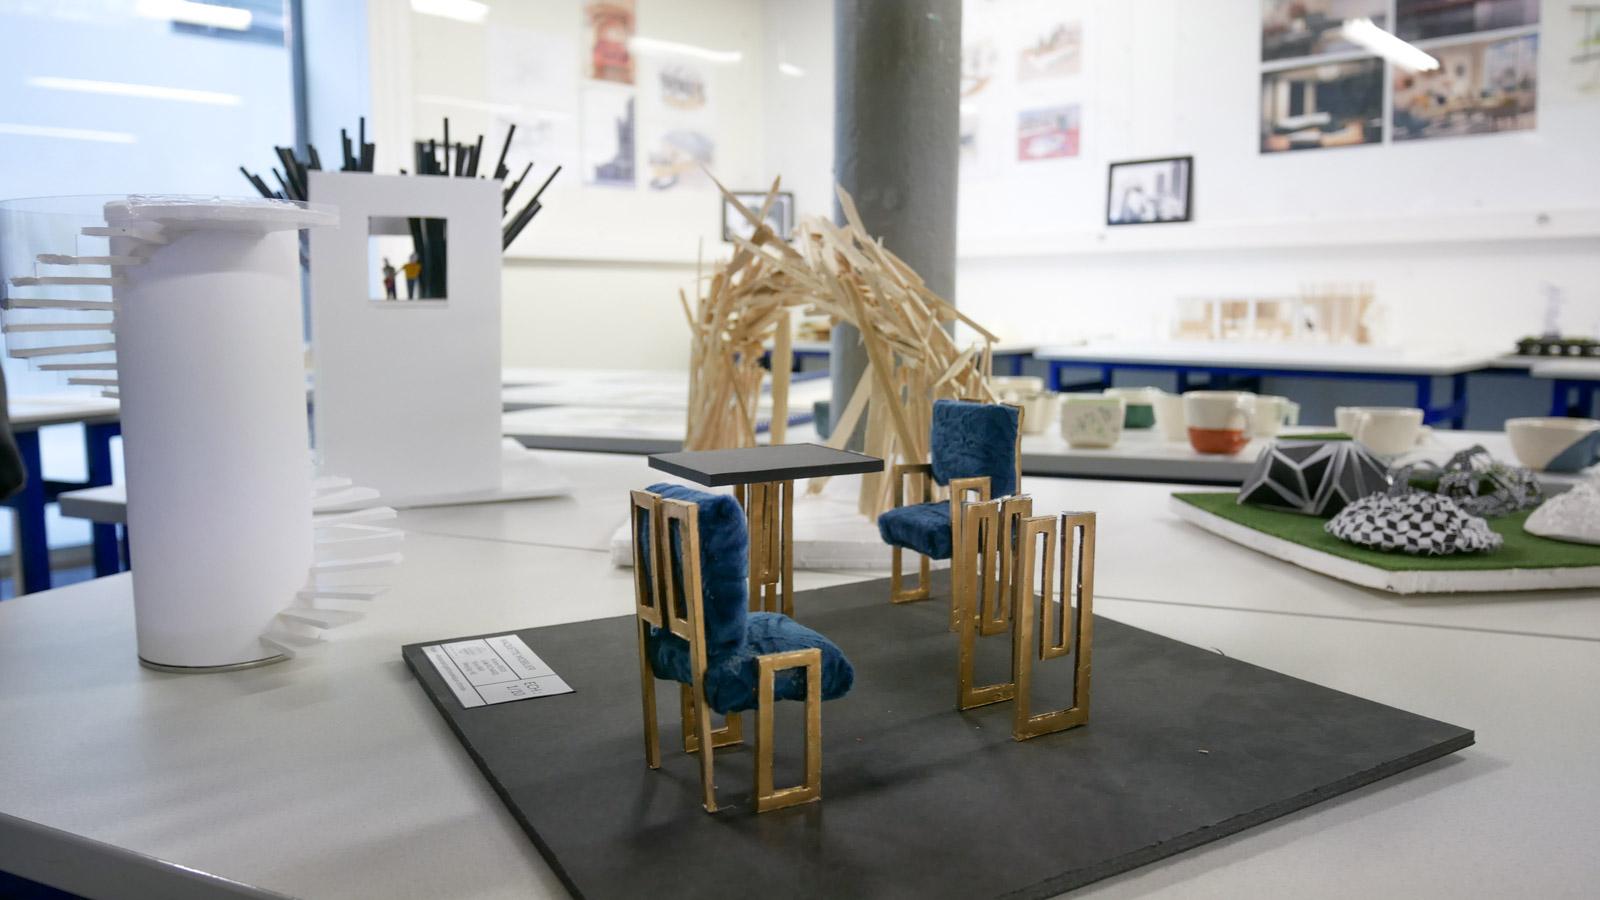 Design chaise limart